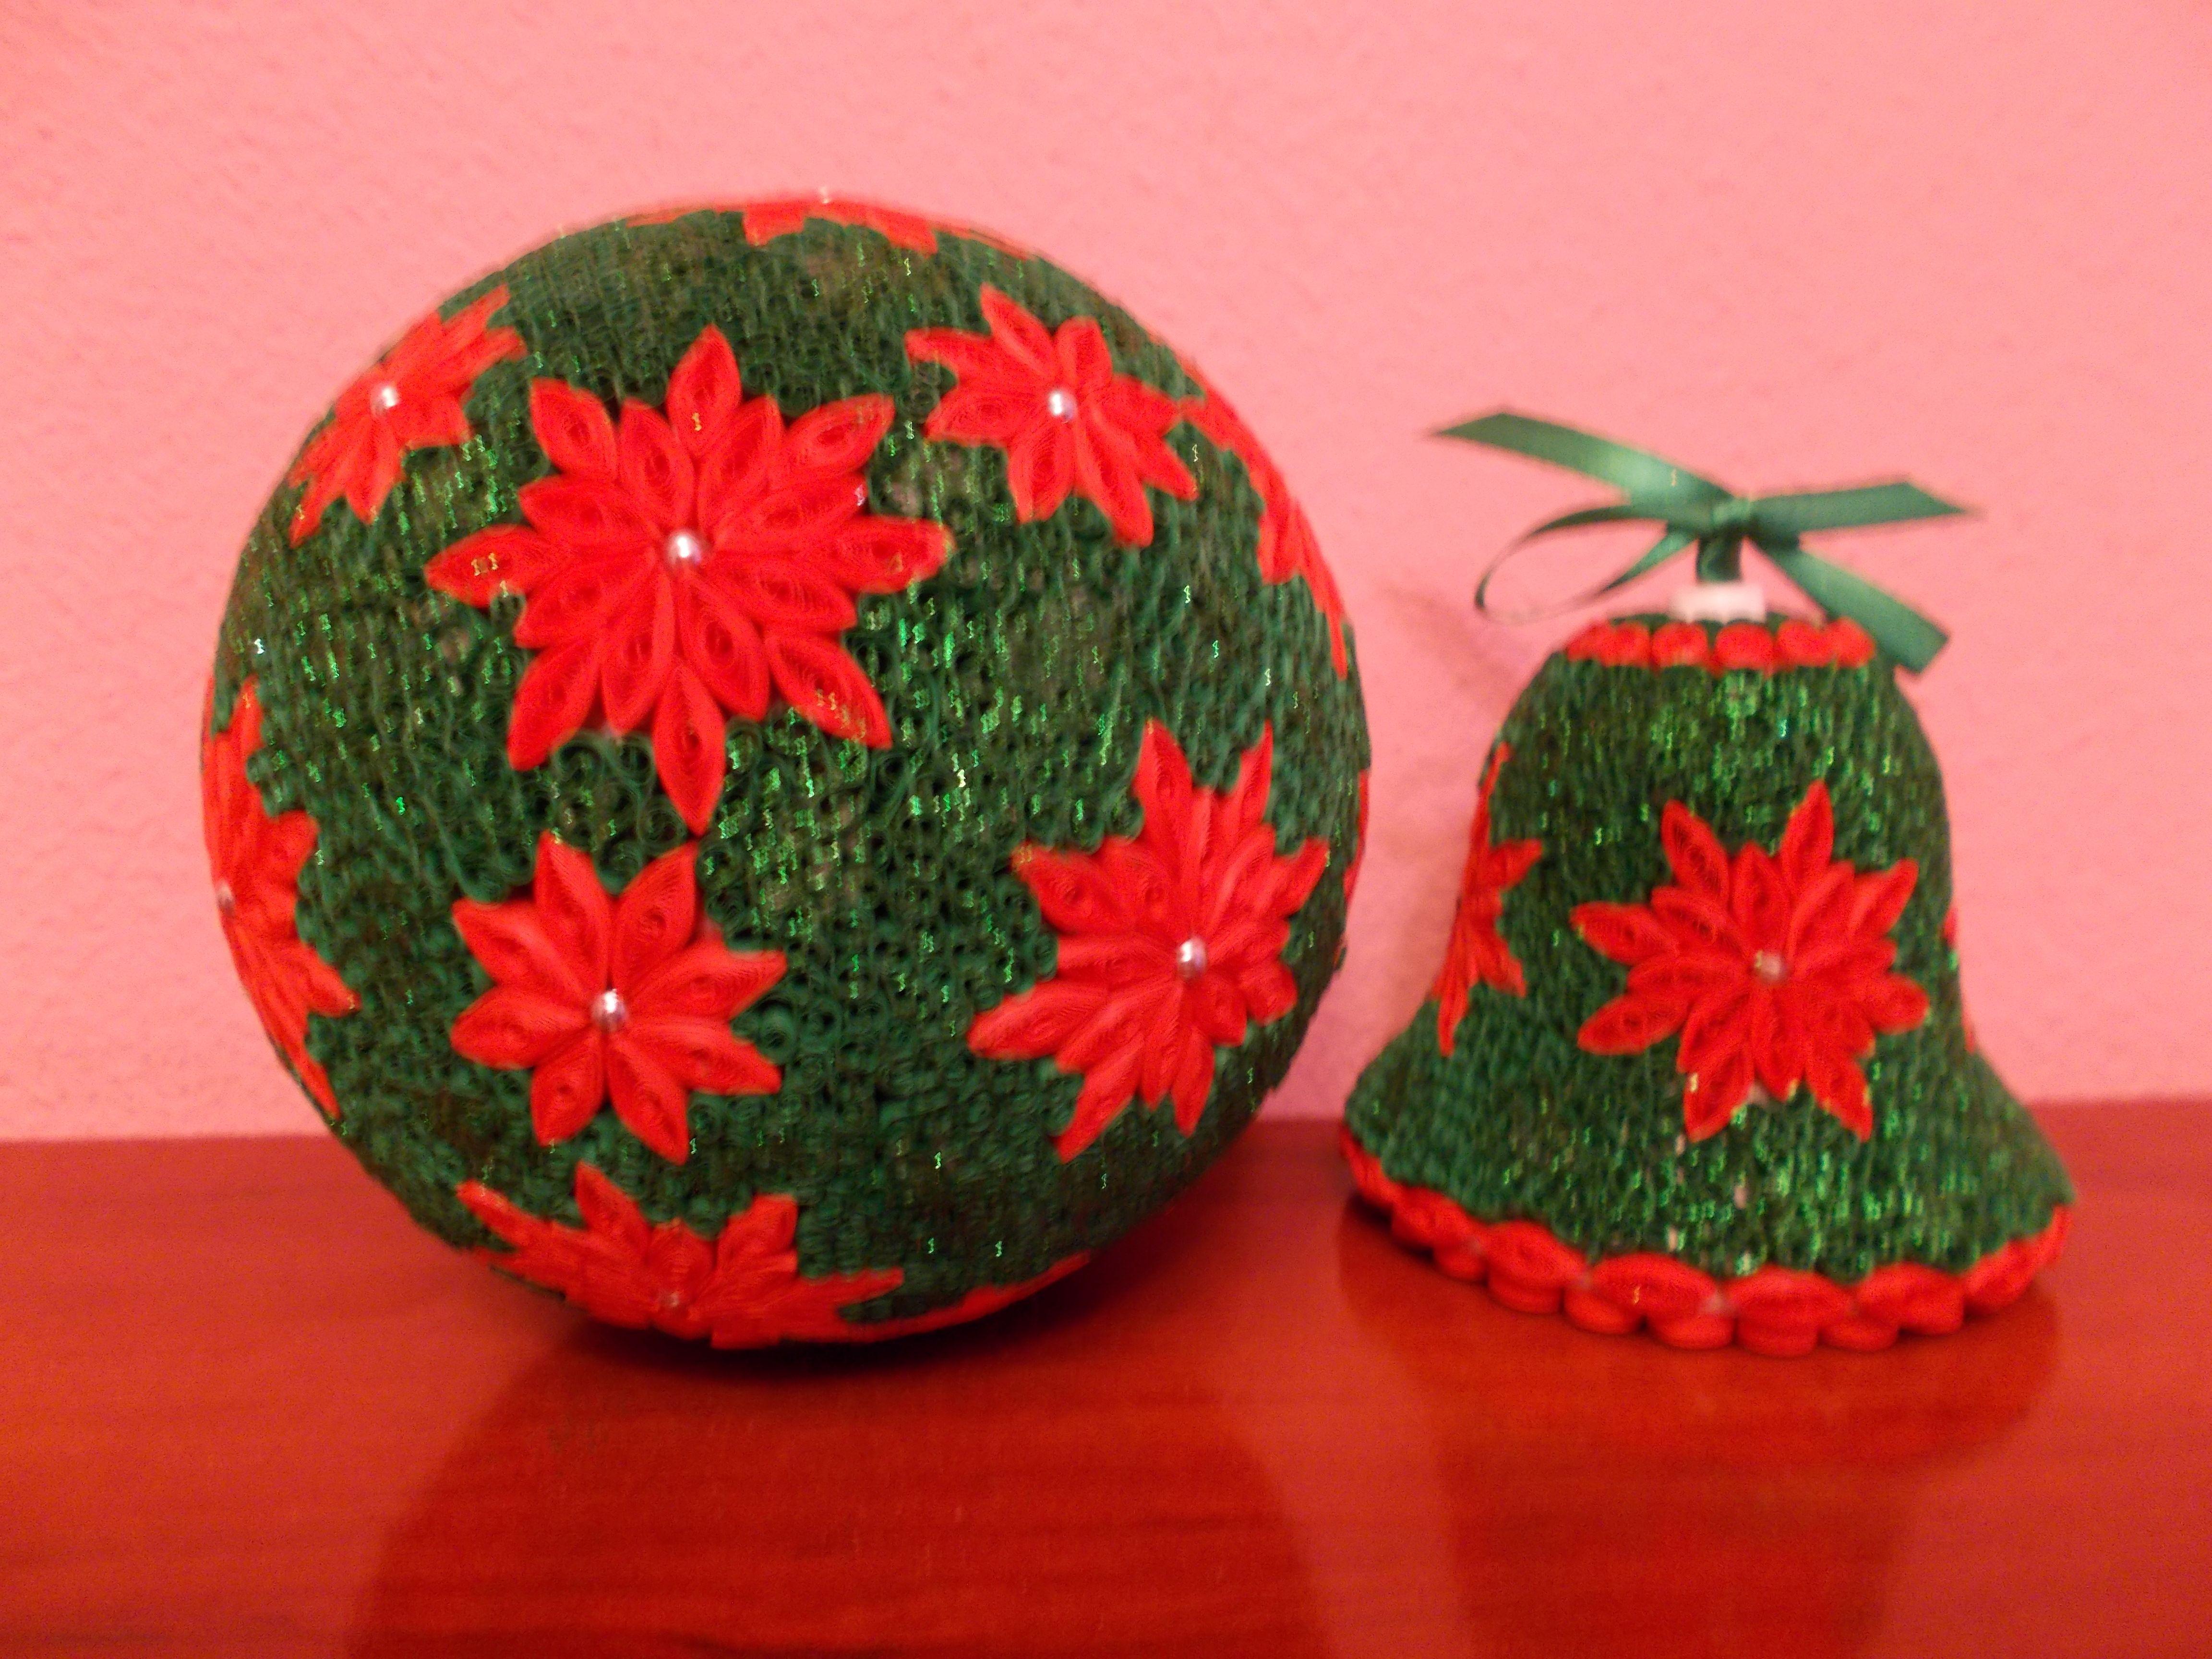 Strawberry christmas ornaments - Christmas Ornament